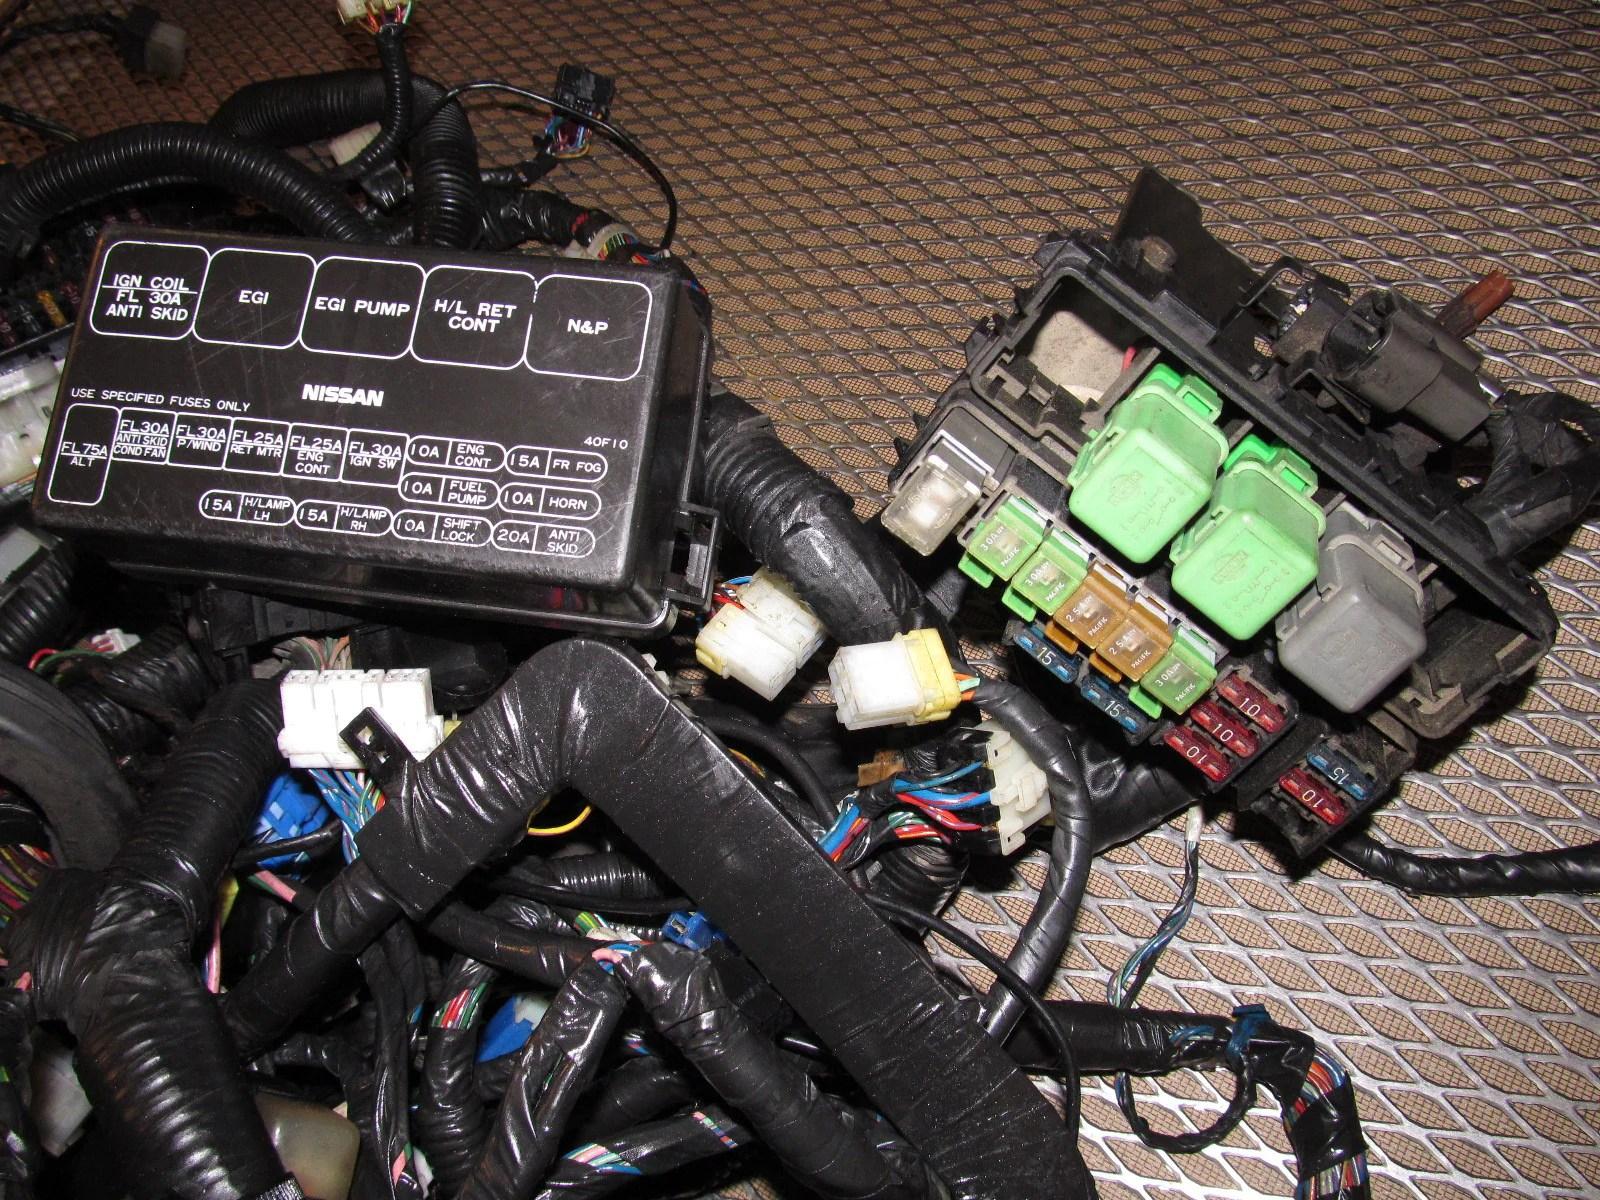 s13 fuse box wiring diagram show fuse box diagram 240sx fuse box diagram s13 [ 1600 x 1200 Pixel ]